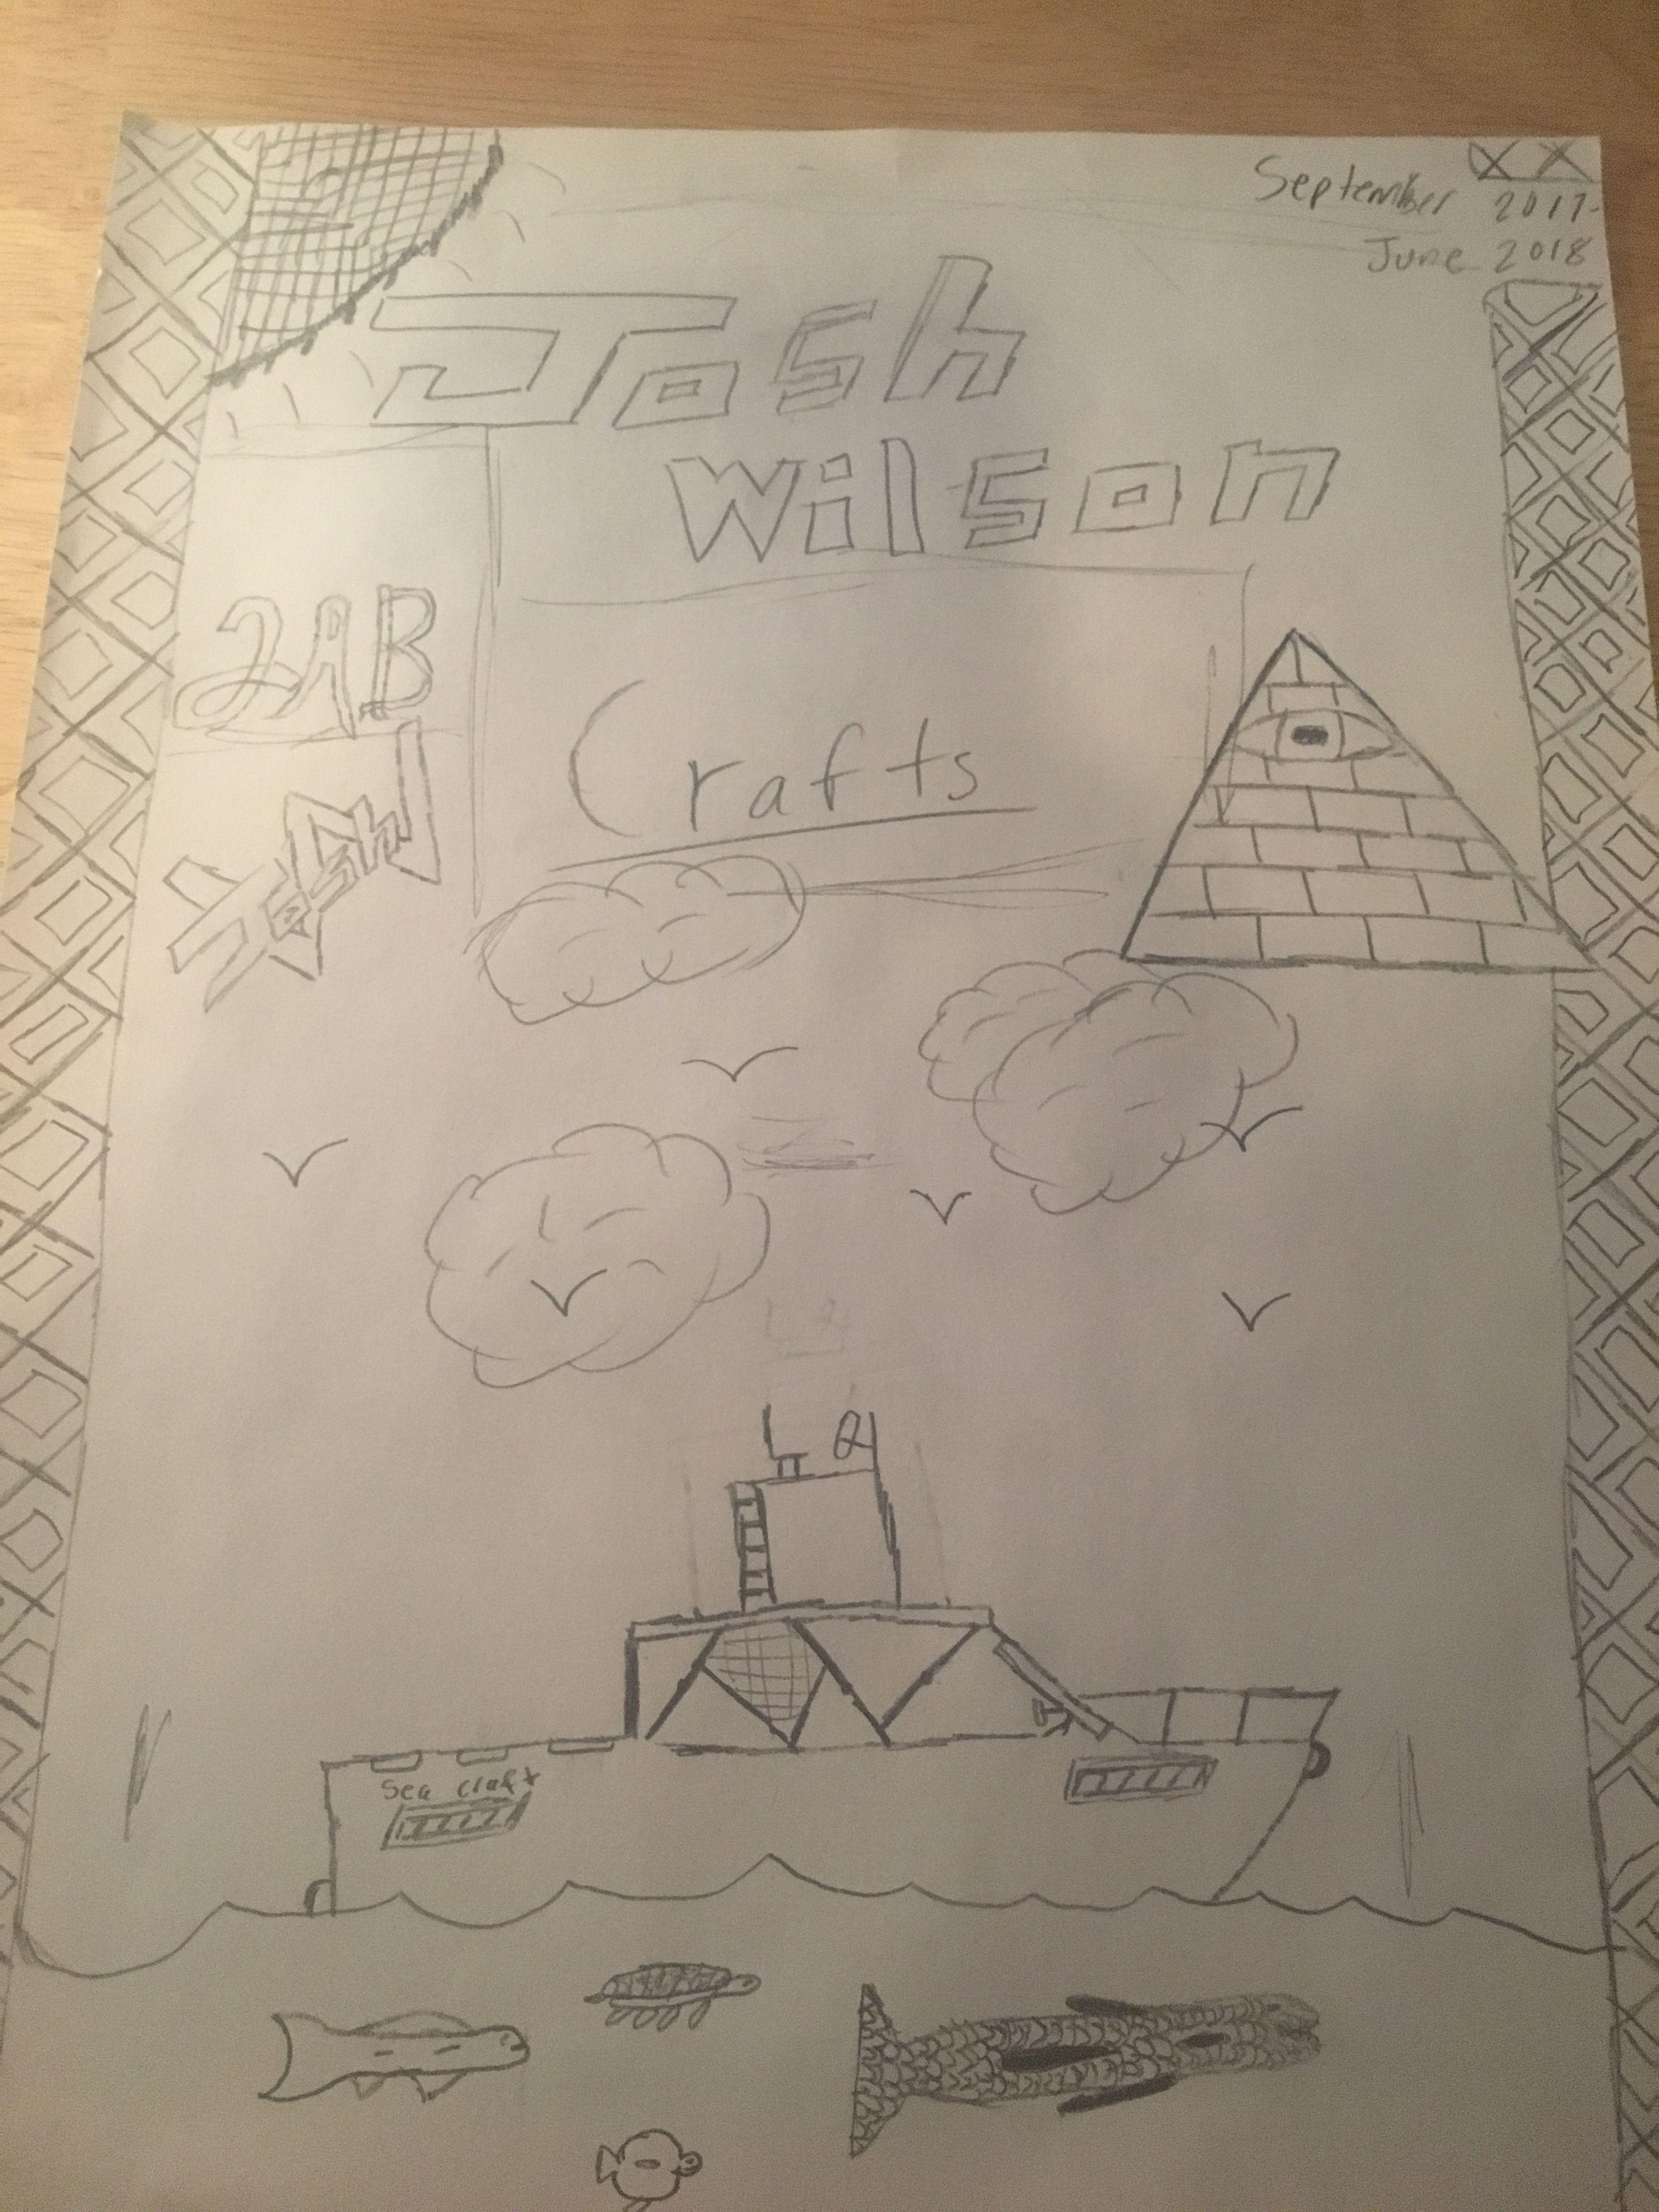 Sketch Book Cover Rough Copy 9 21